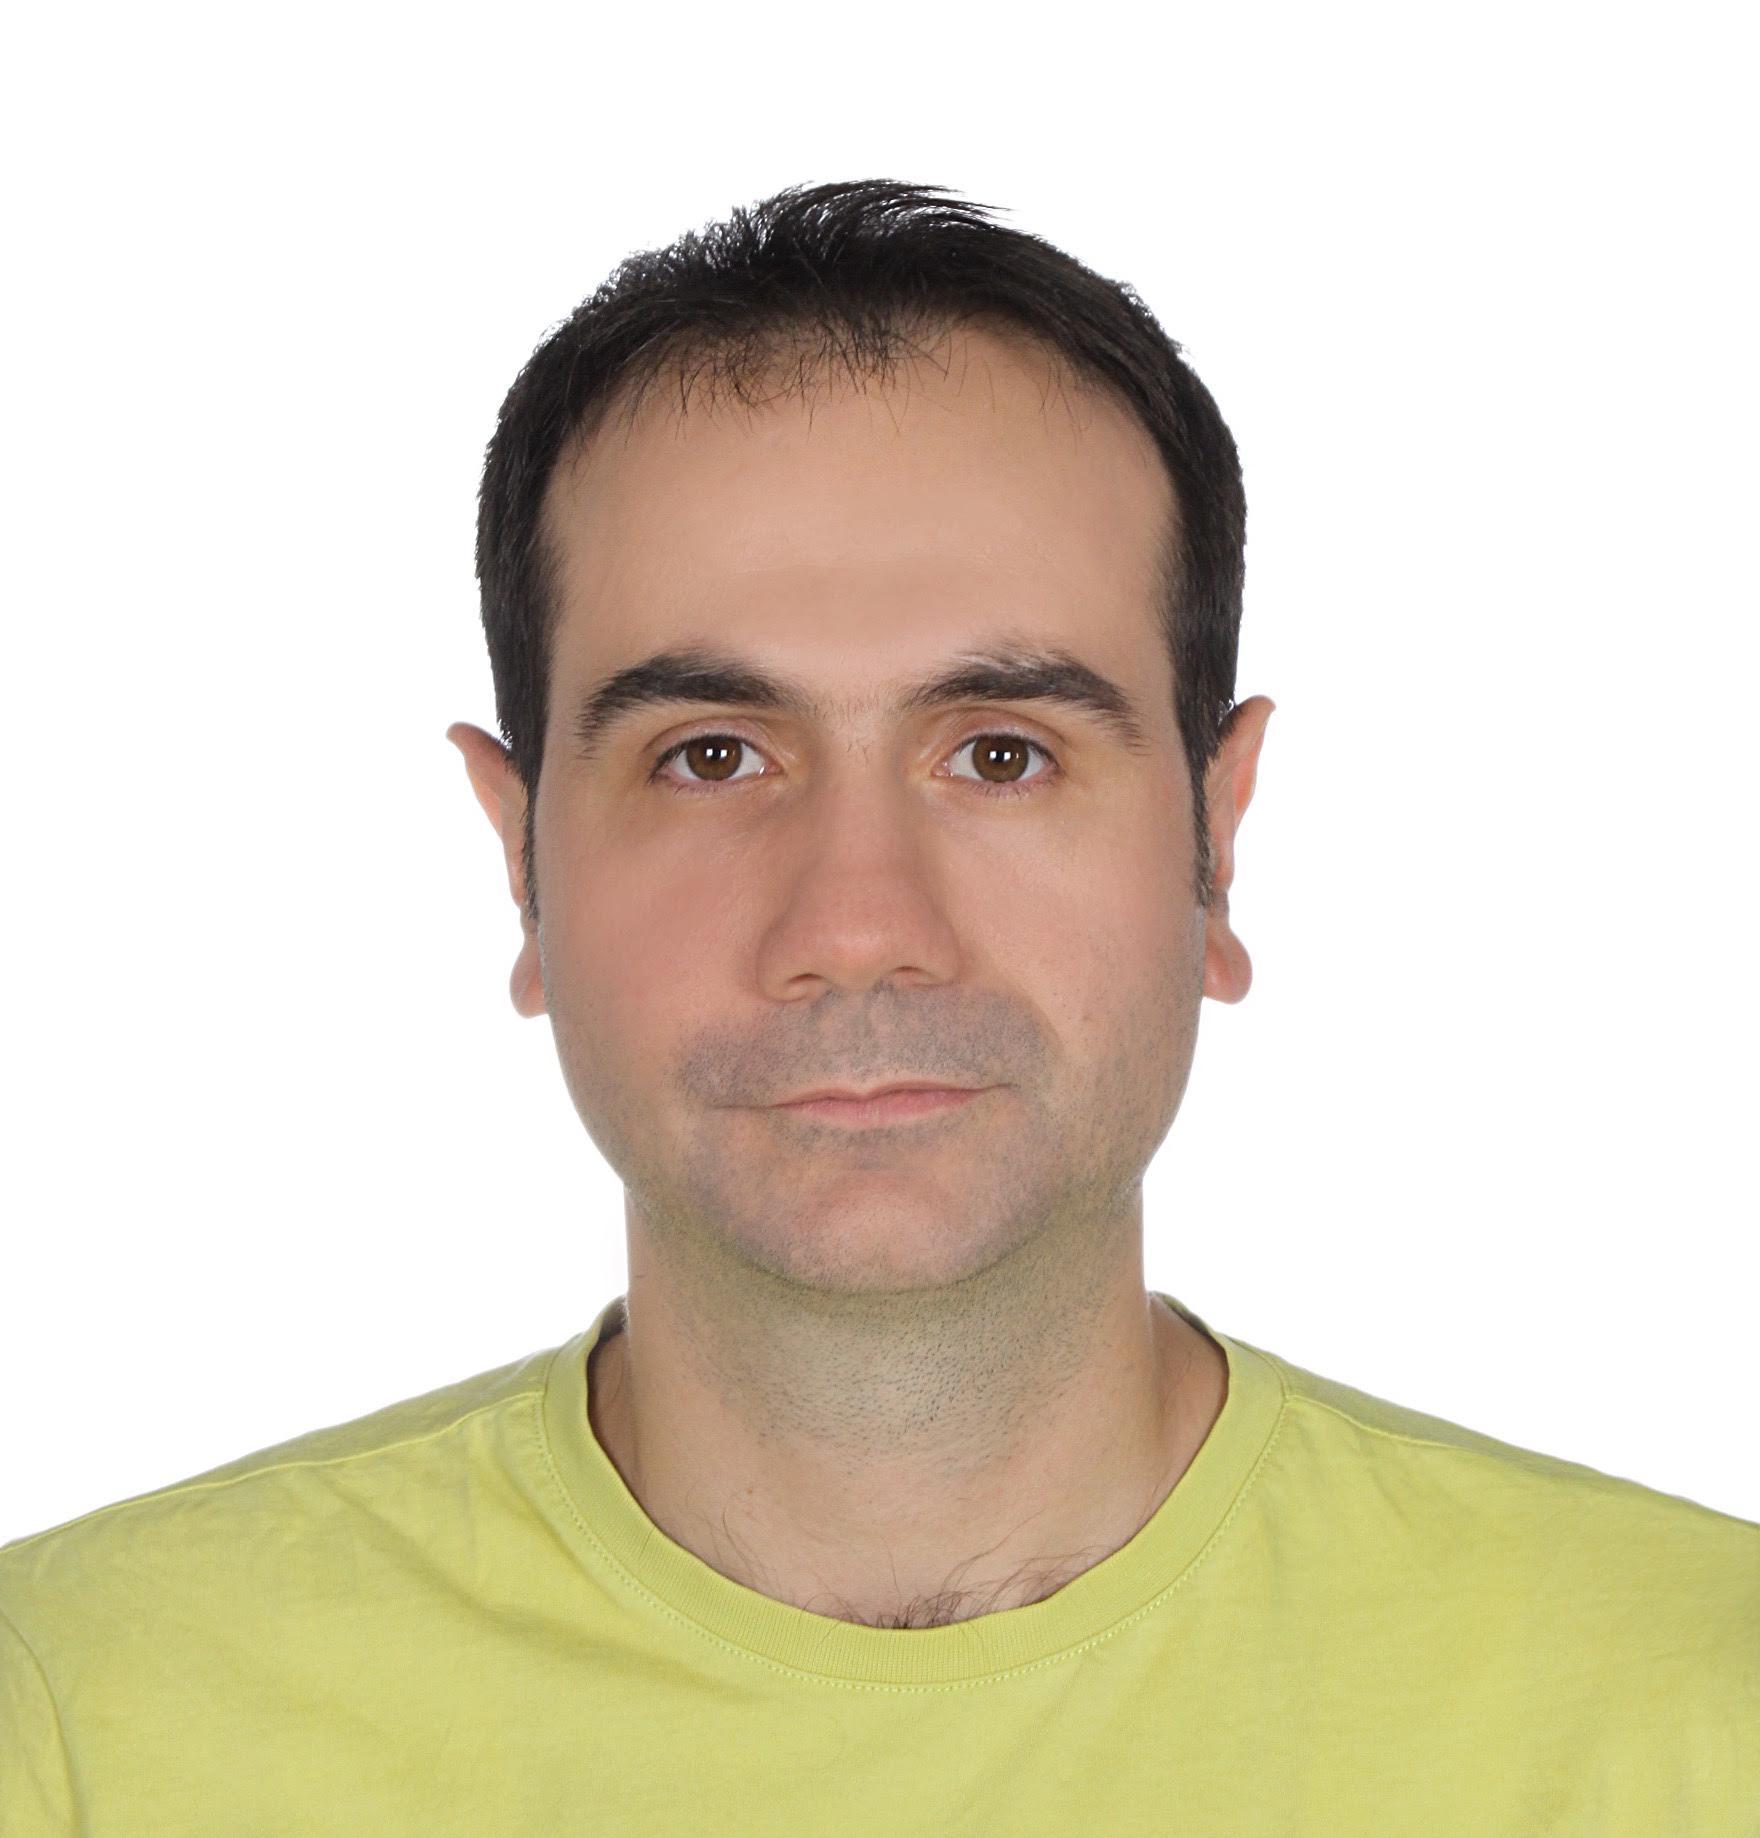 İrfan Nuri Karaca Picture